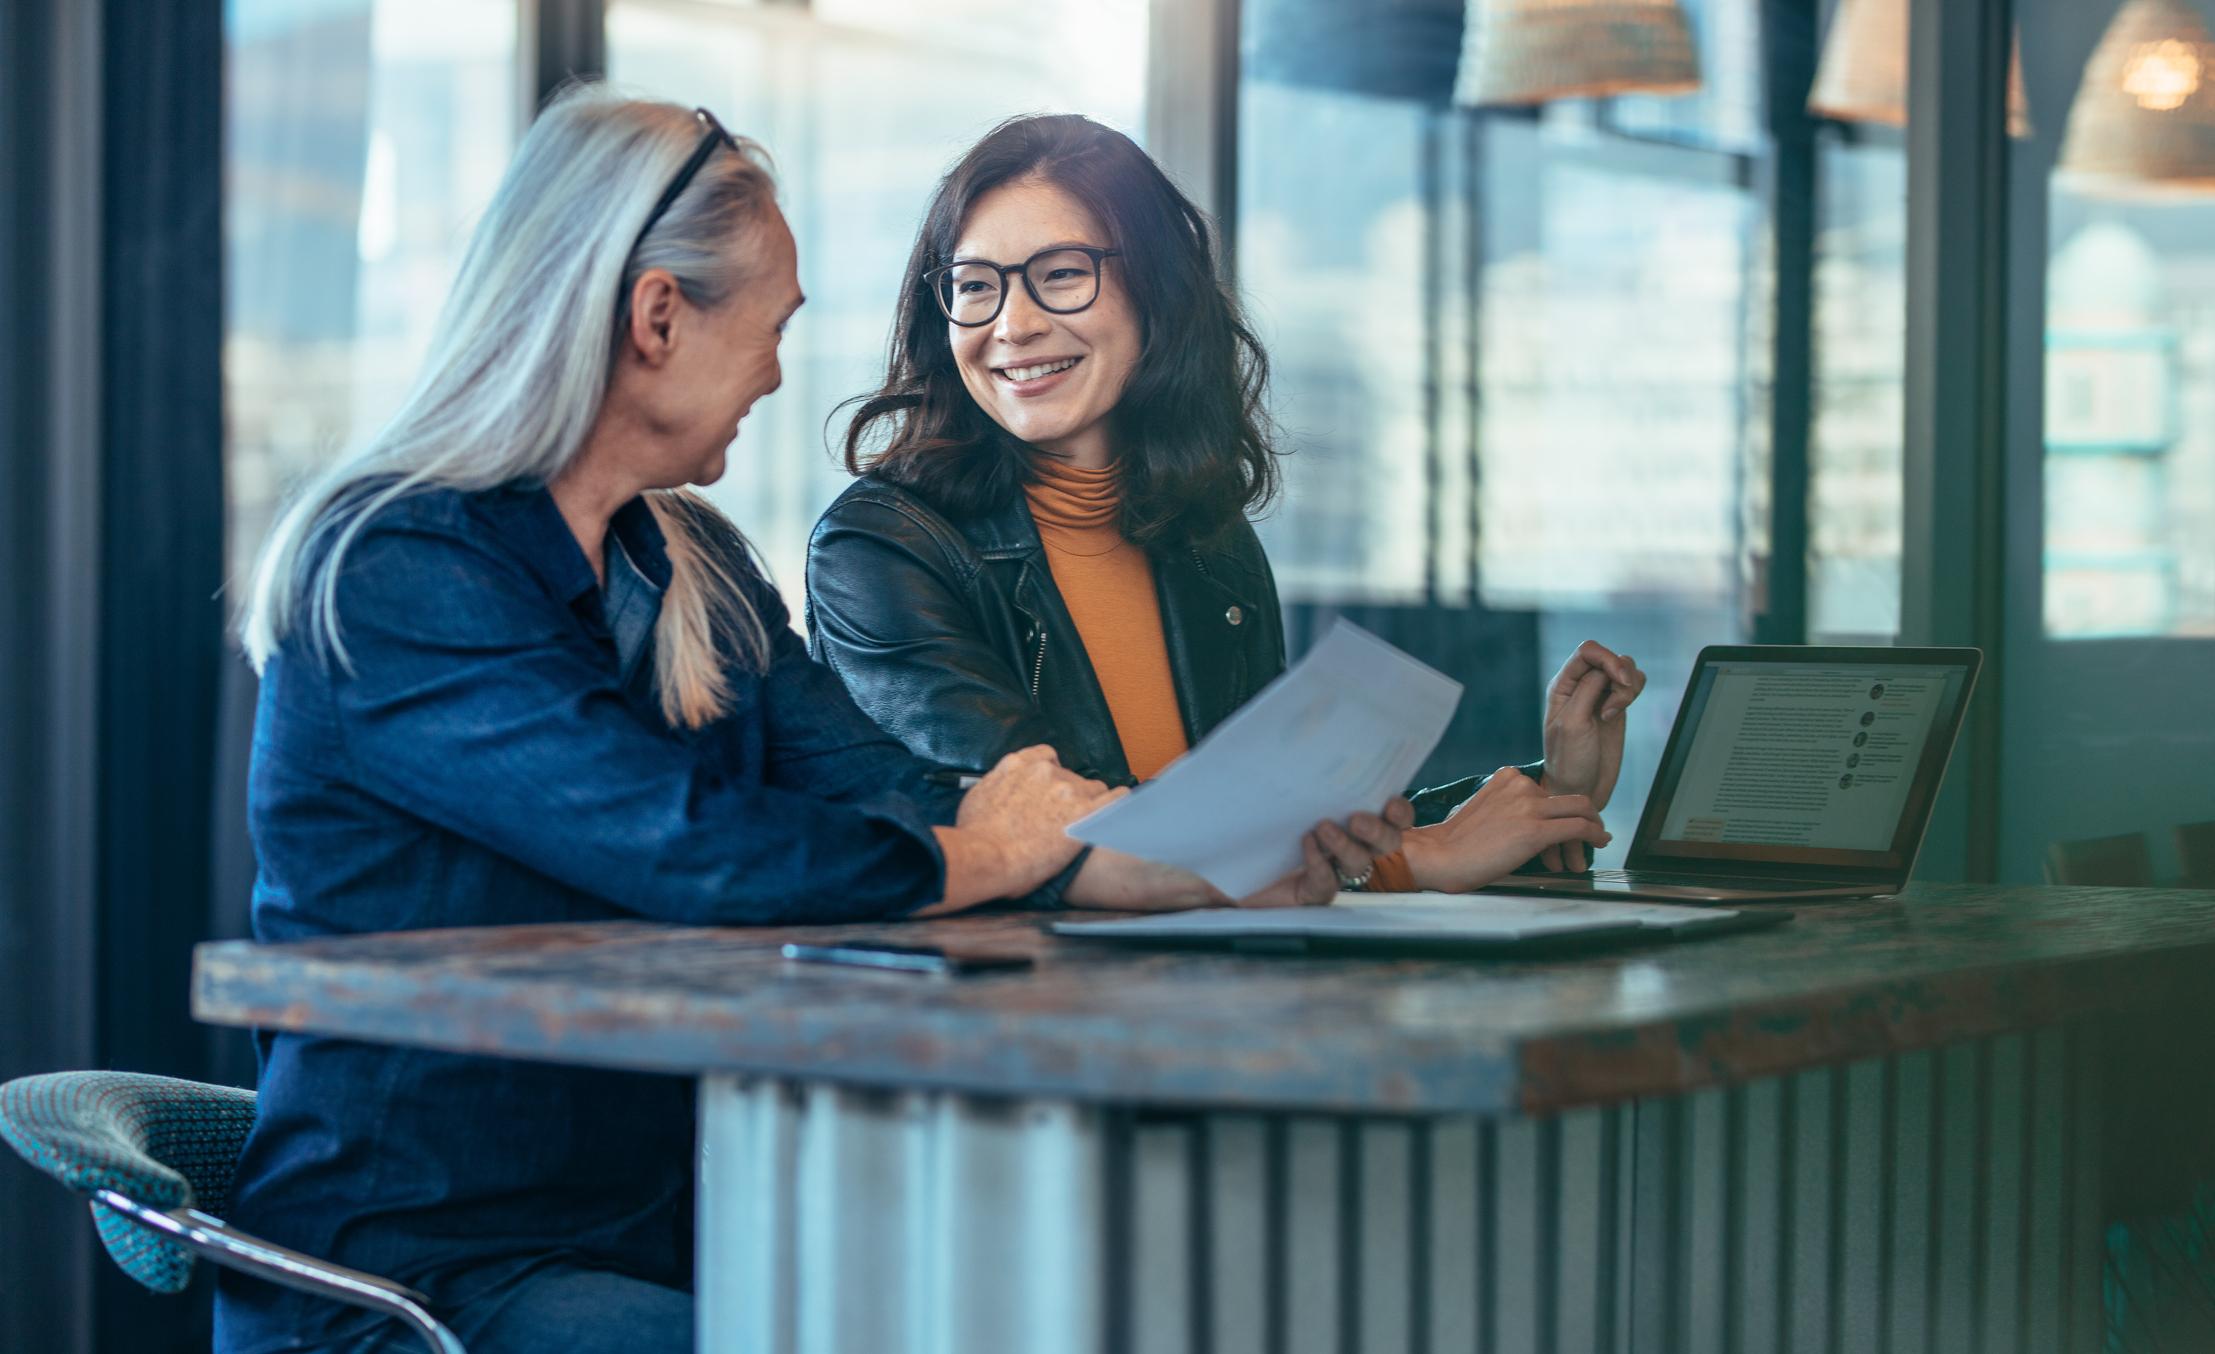 Connect through leadership storytelling